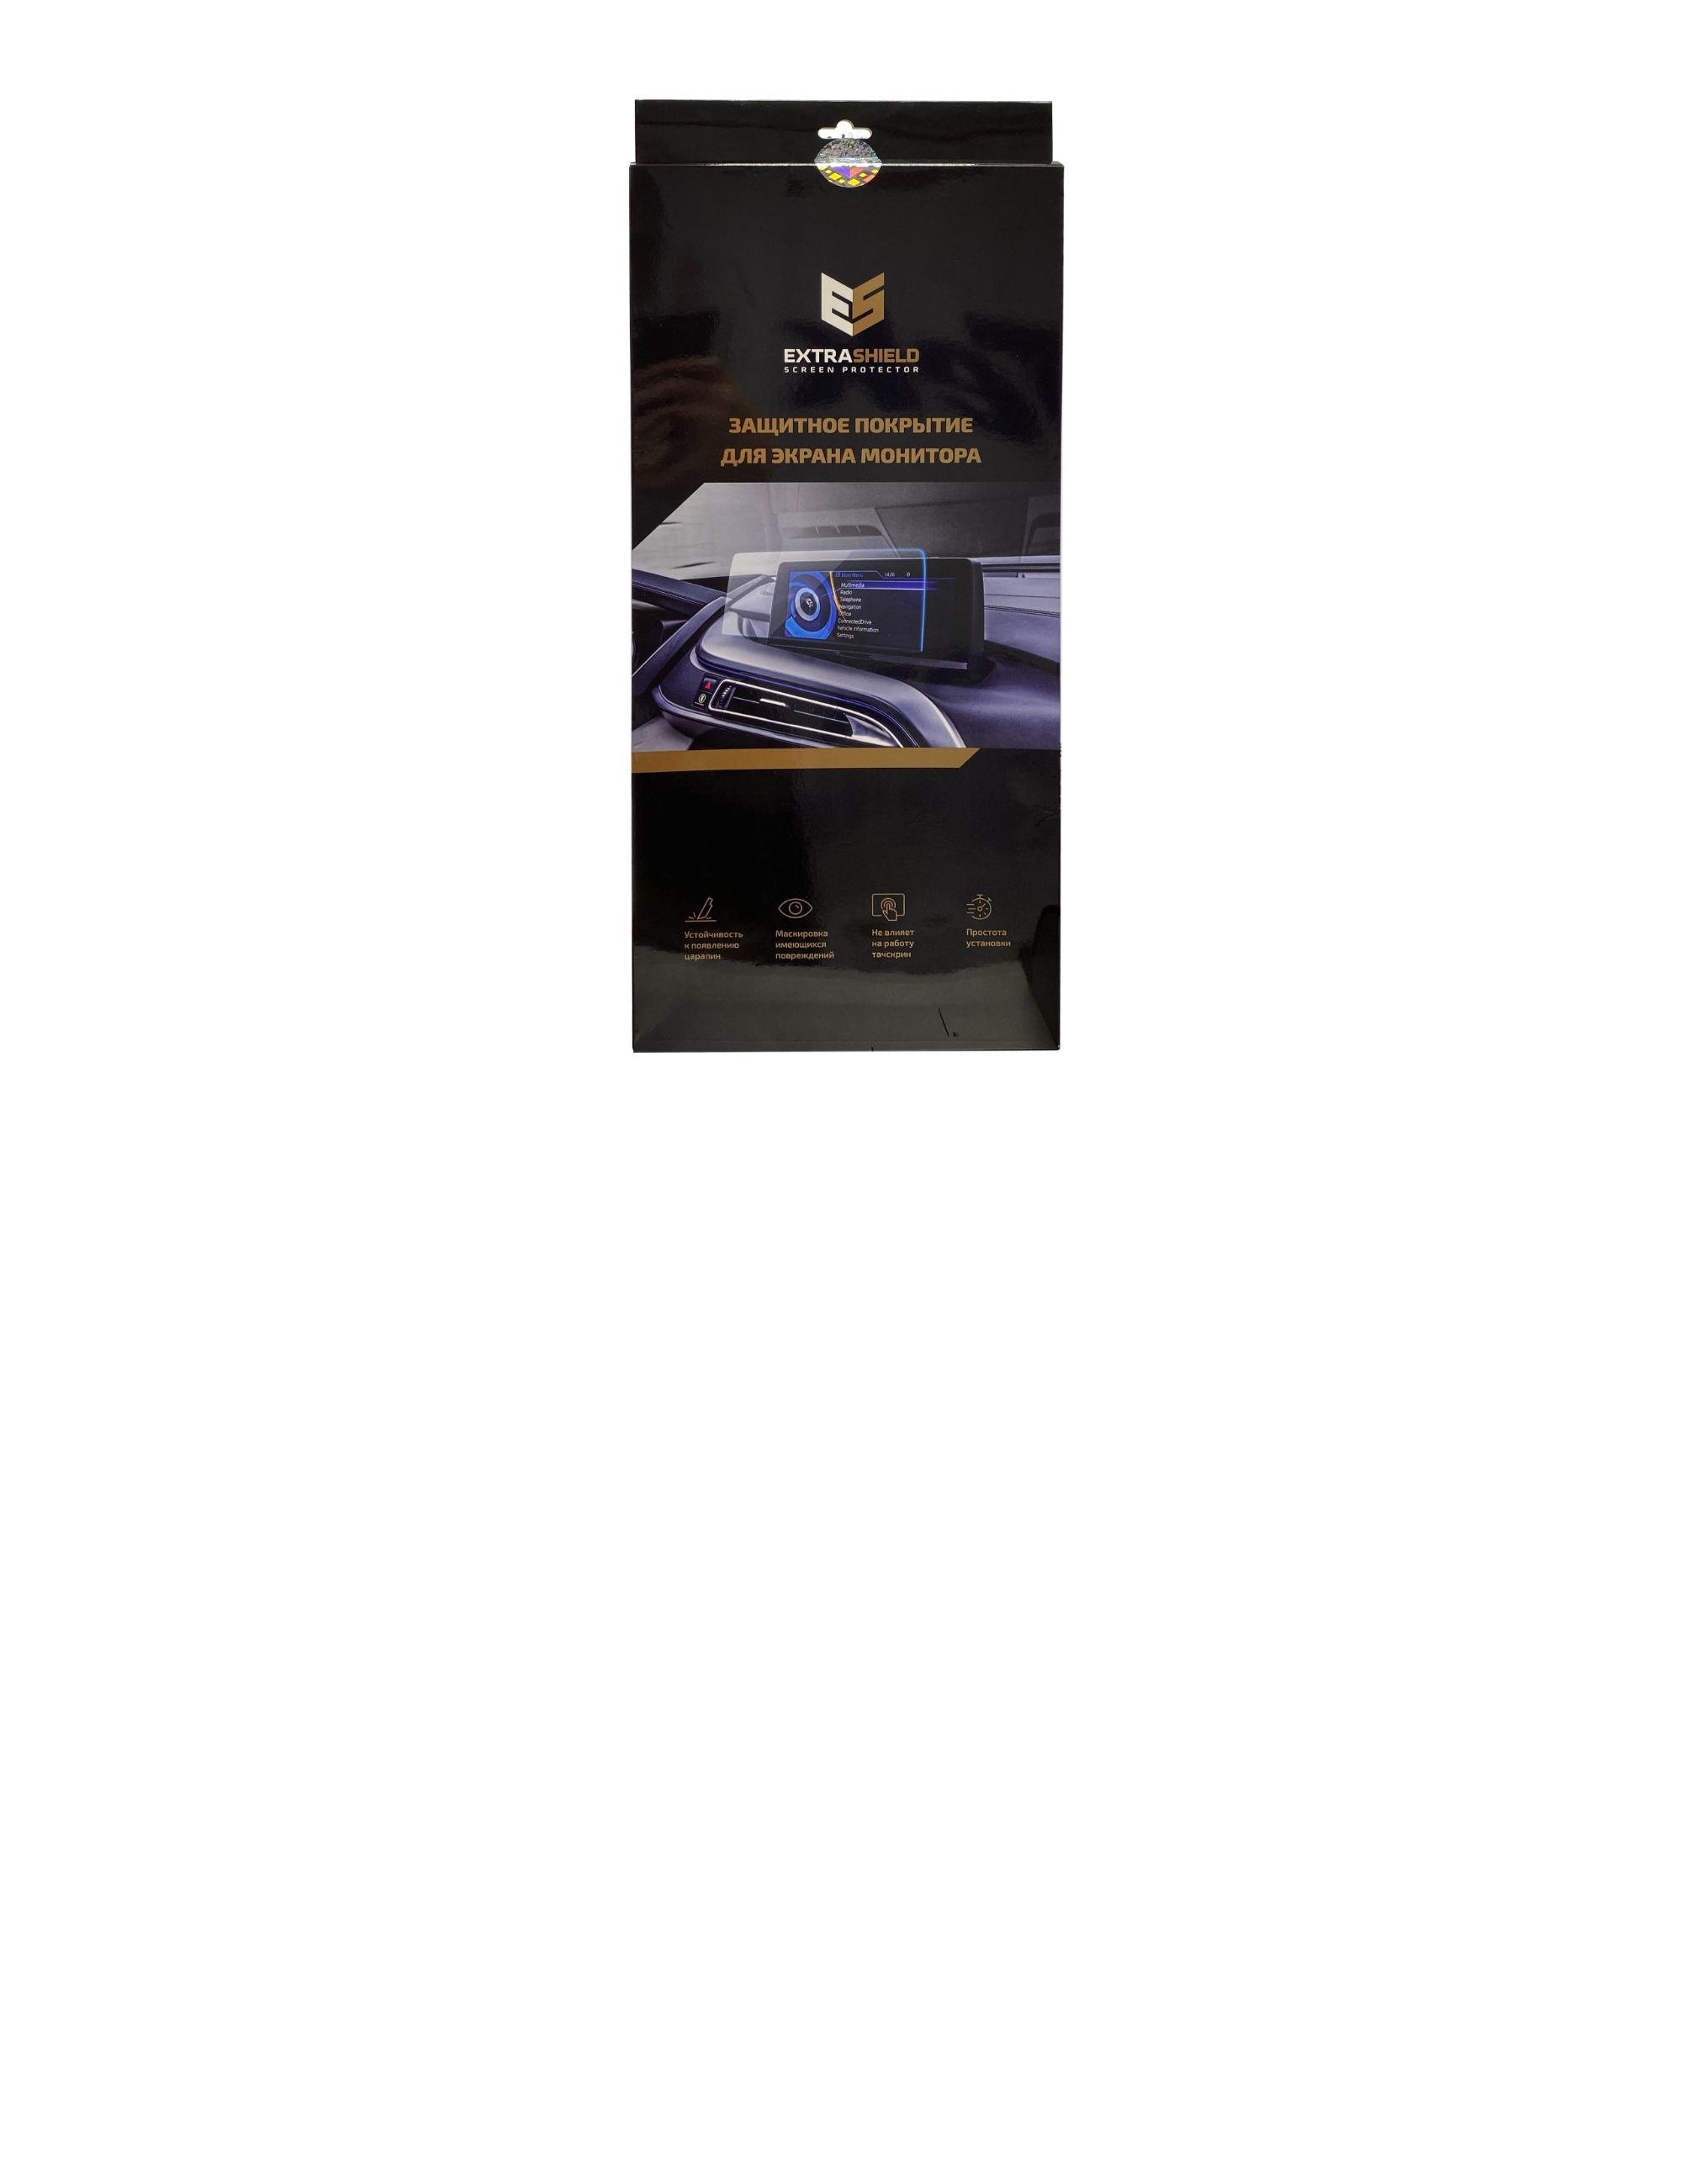 Land Rover Range Rover 2013 - 2016 мультимедиа 8 Защитное стекло Матовая